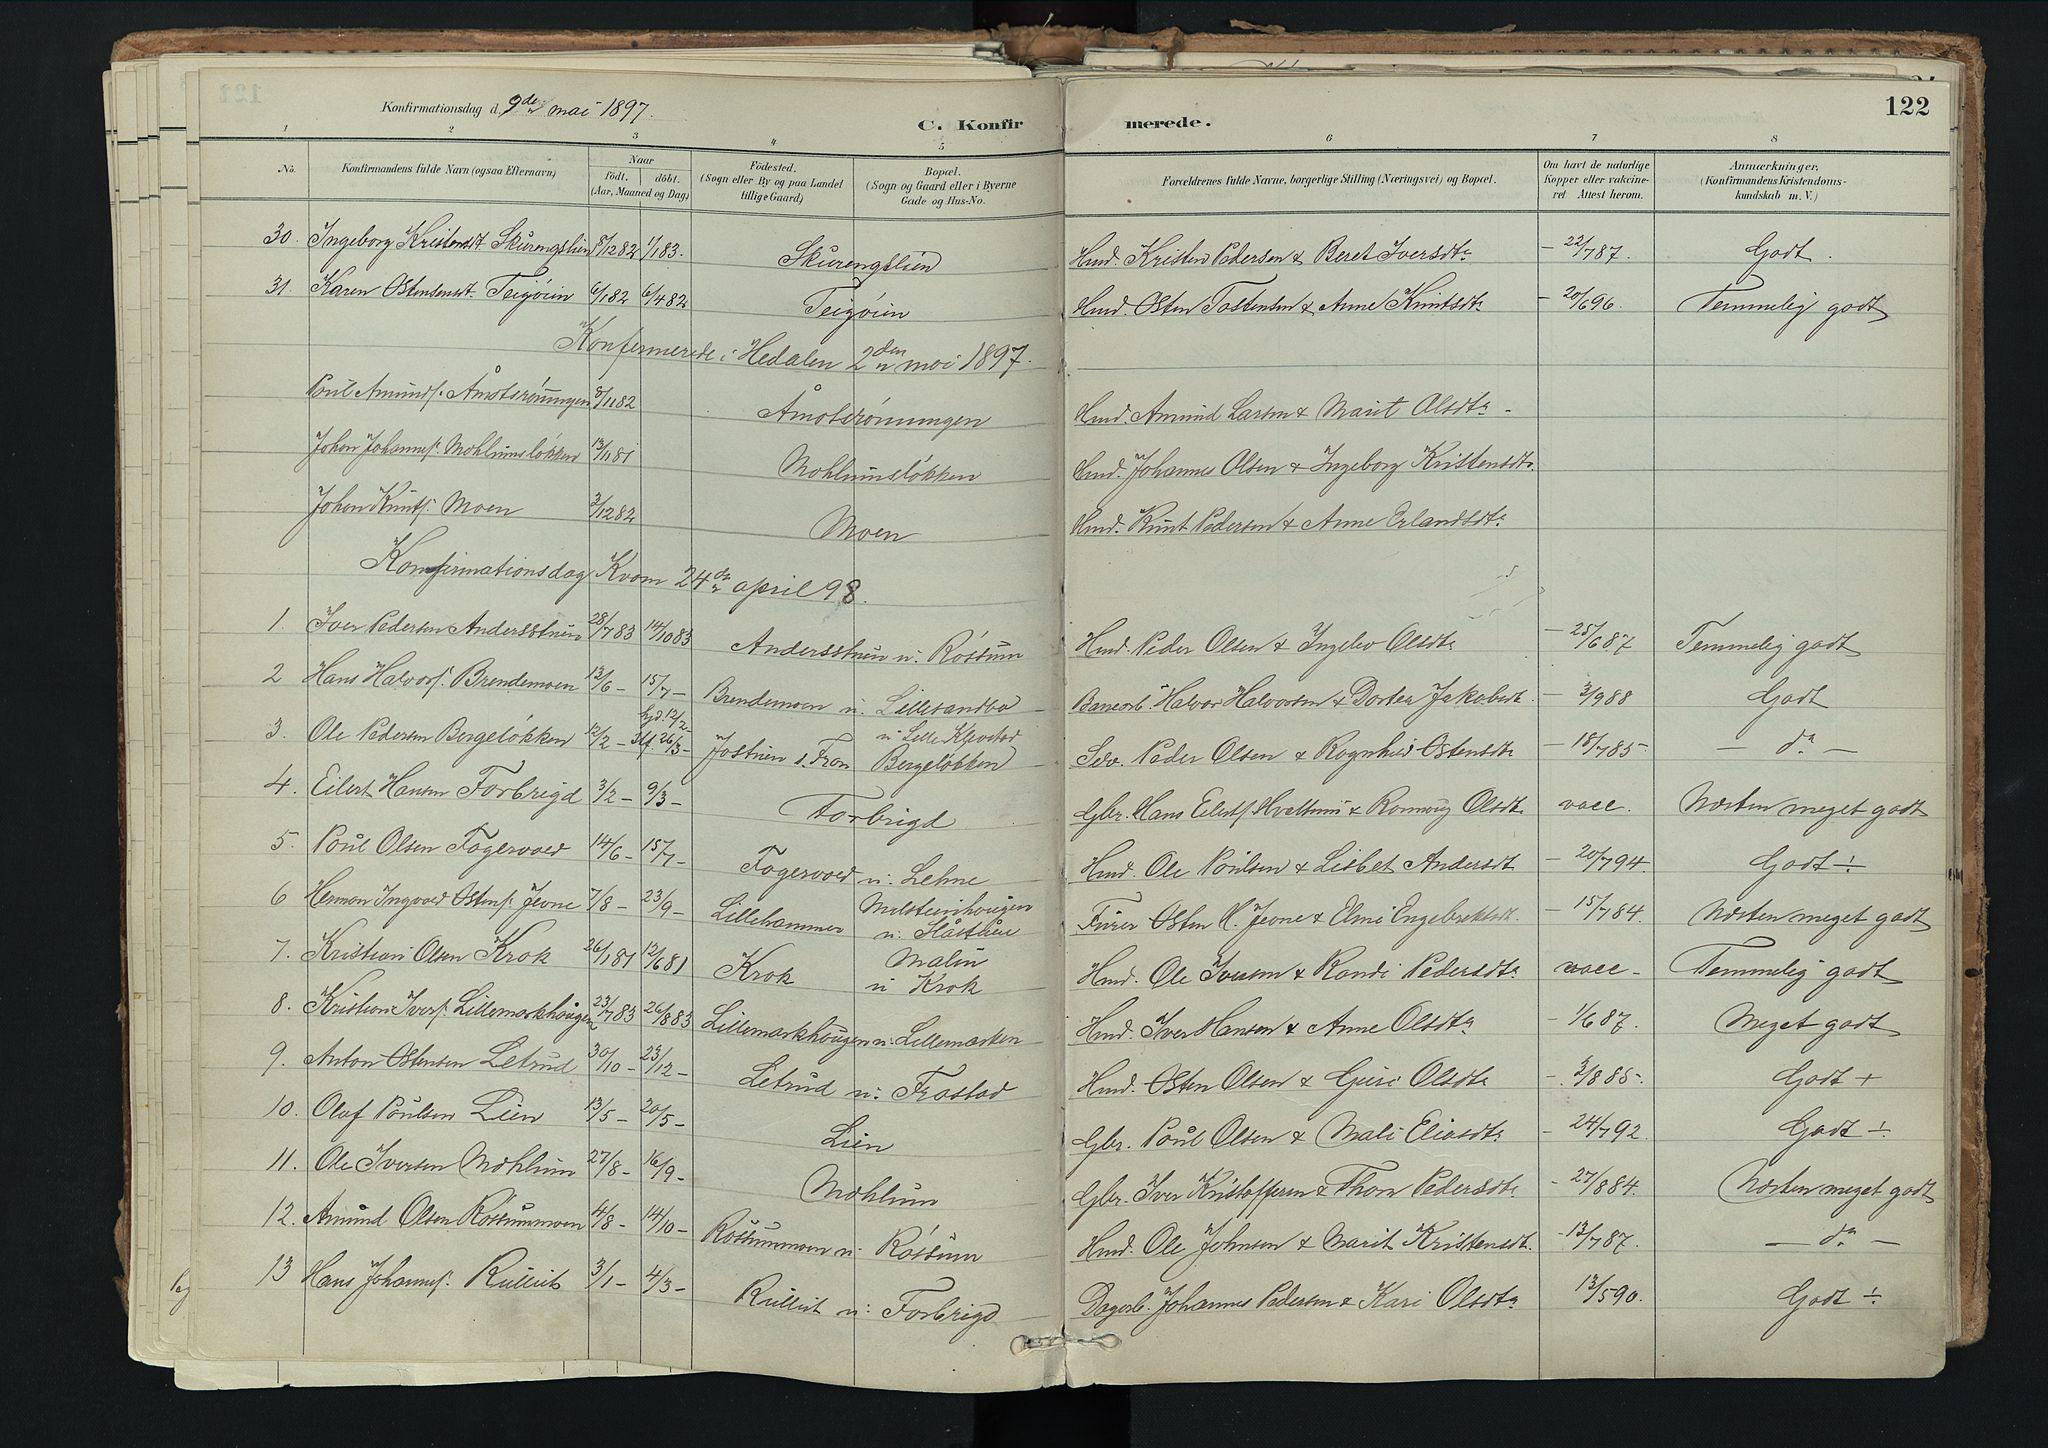 SAH, Nord-Fron prestekontor, Ministerialbok nr. 3, 1884-1914, s. 122